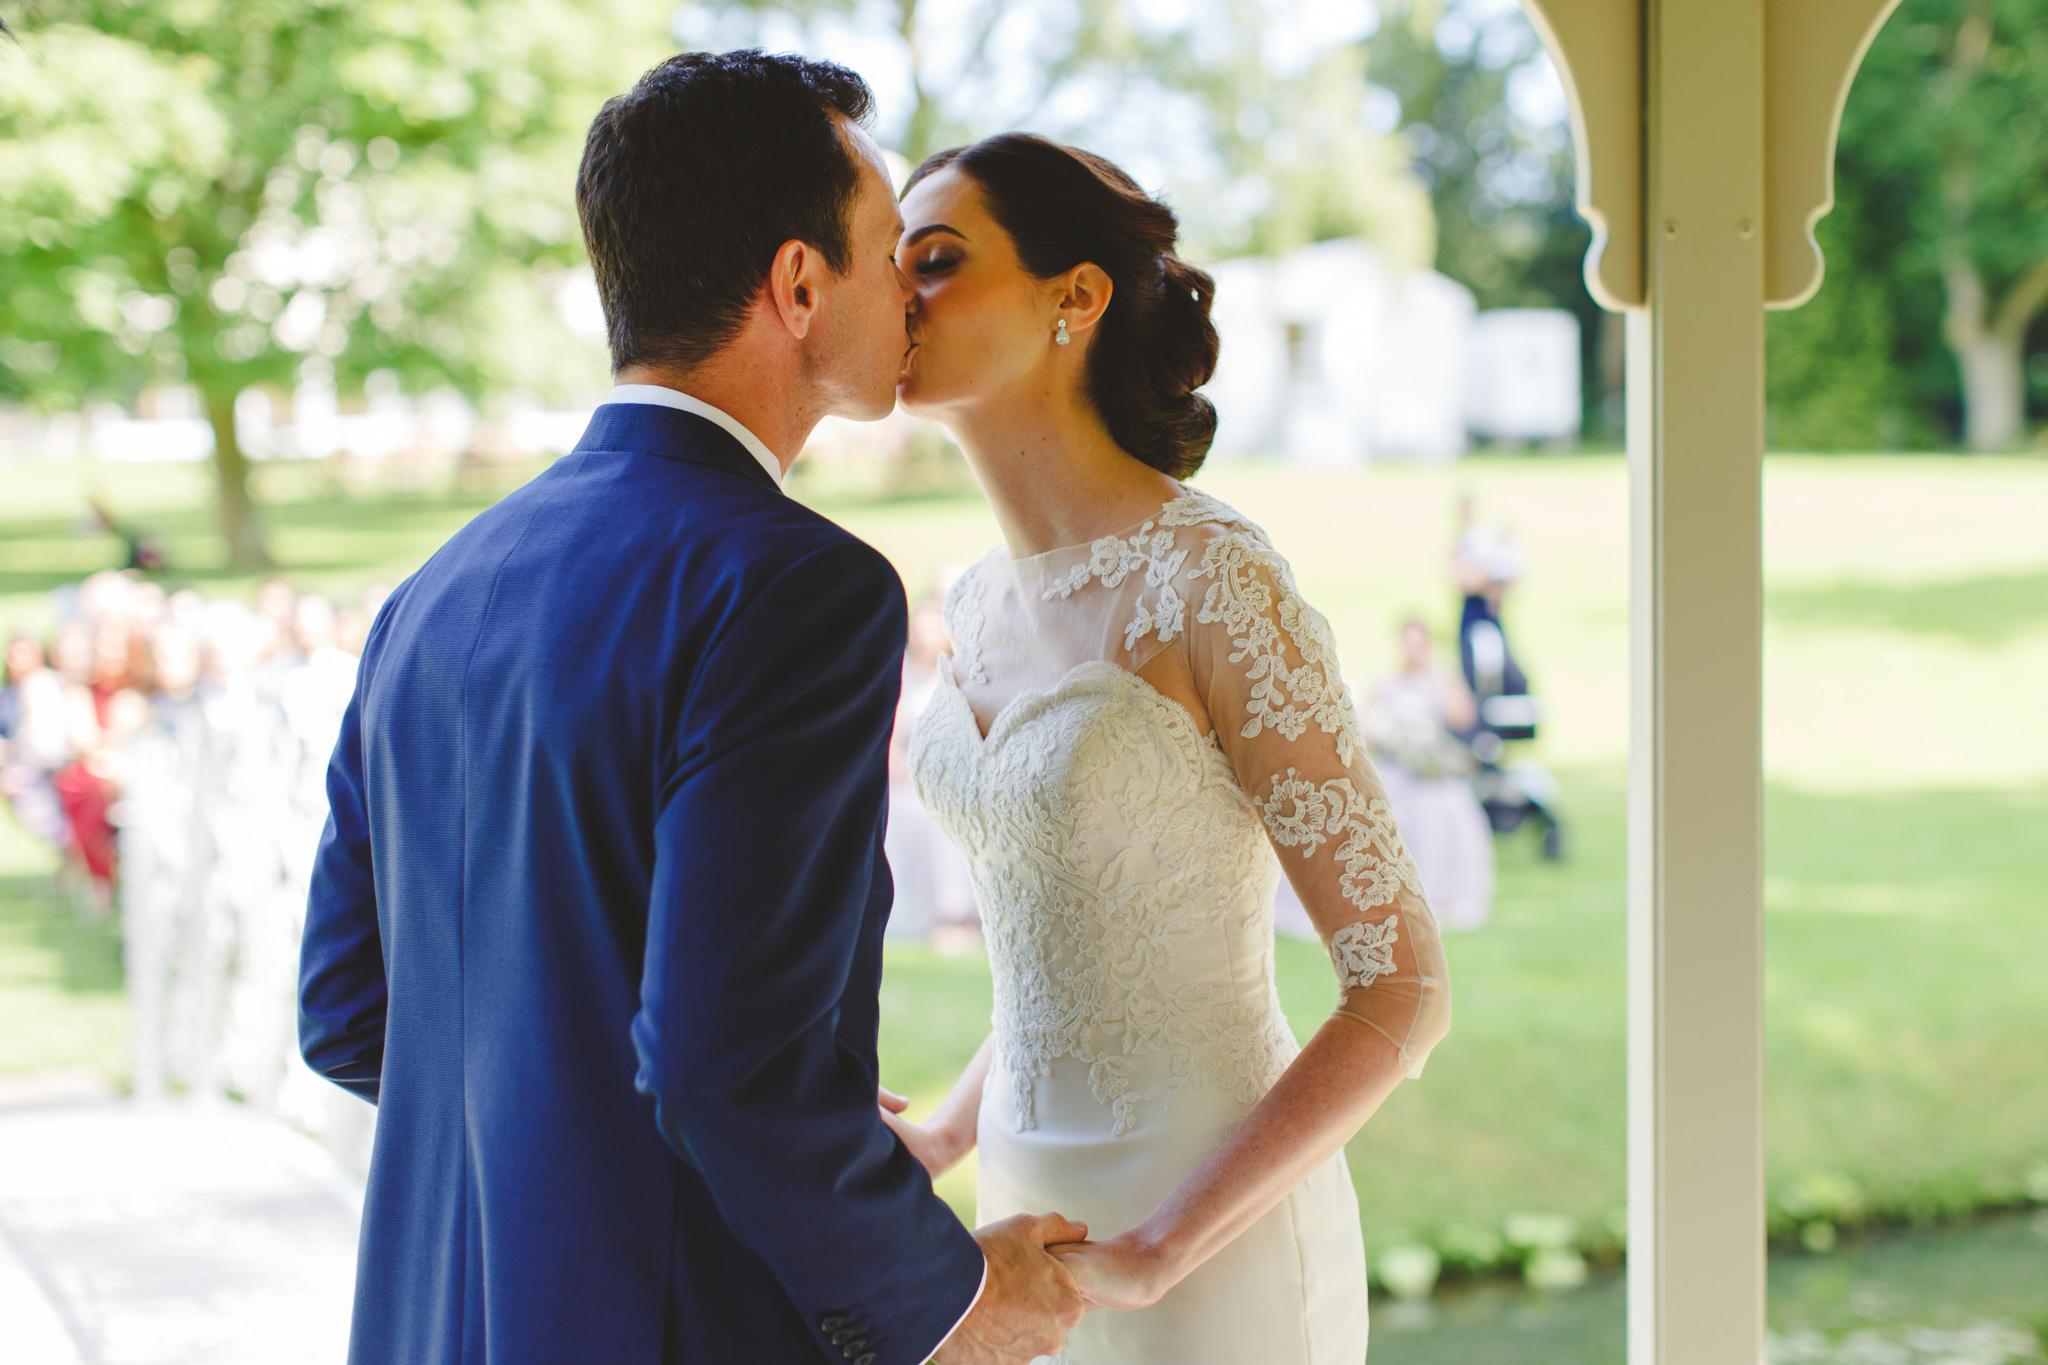 derbyshire-wedding-photographer-videographer-camera-hannah-19.jpg